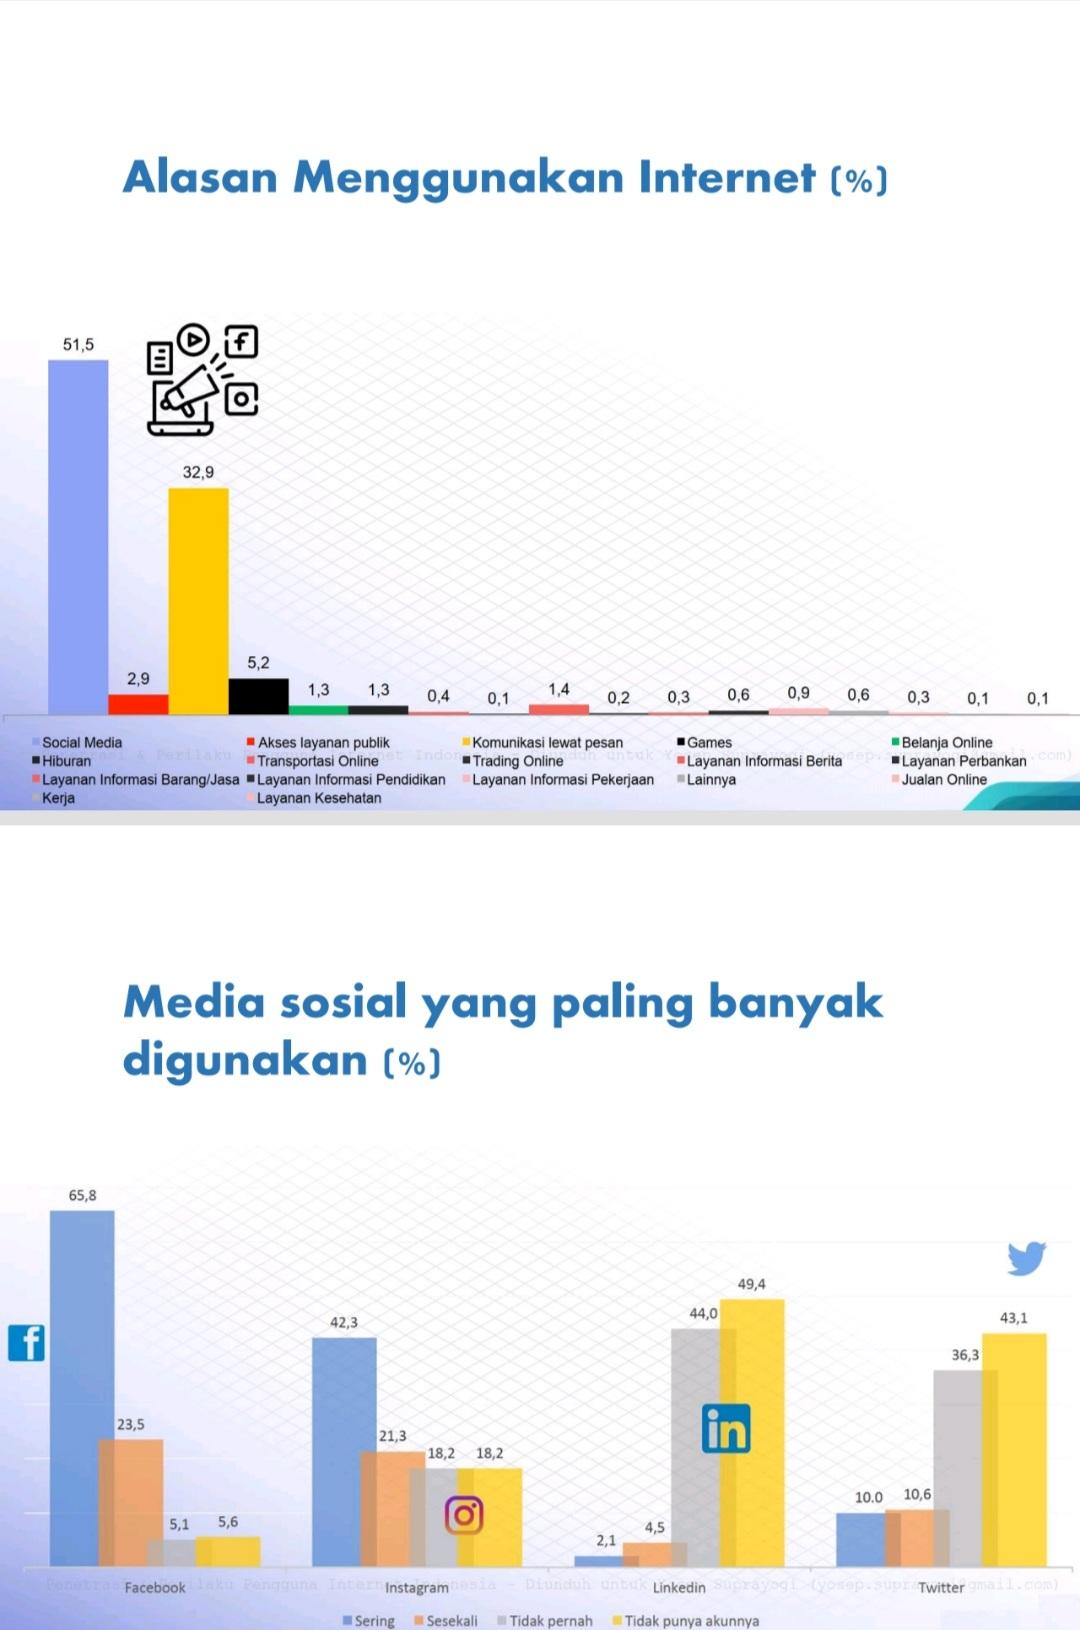 News Cafe Jurnalistik, Transformasi Media Massa ke Era Digital 6 Screenshot 20210928 224643 PPT Reader 1